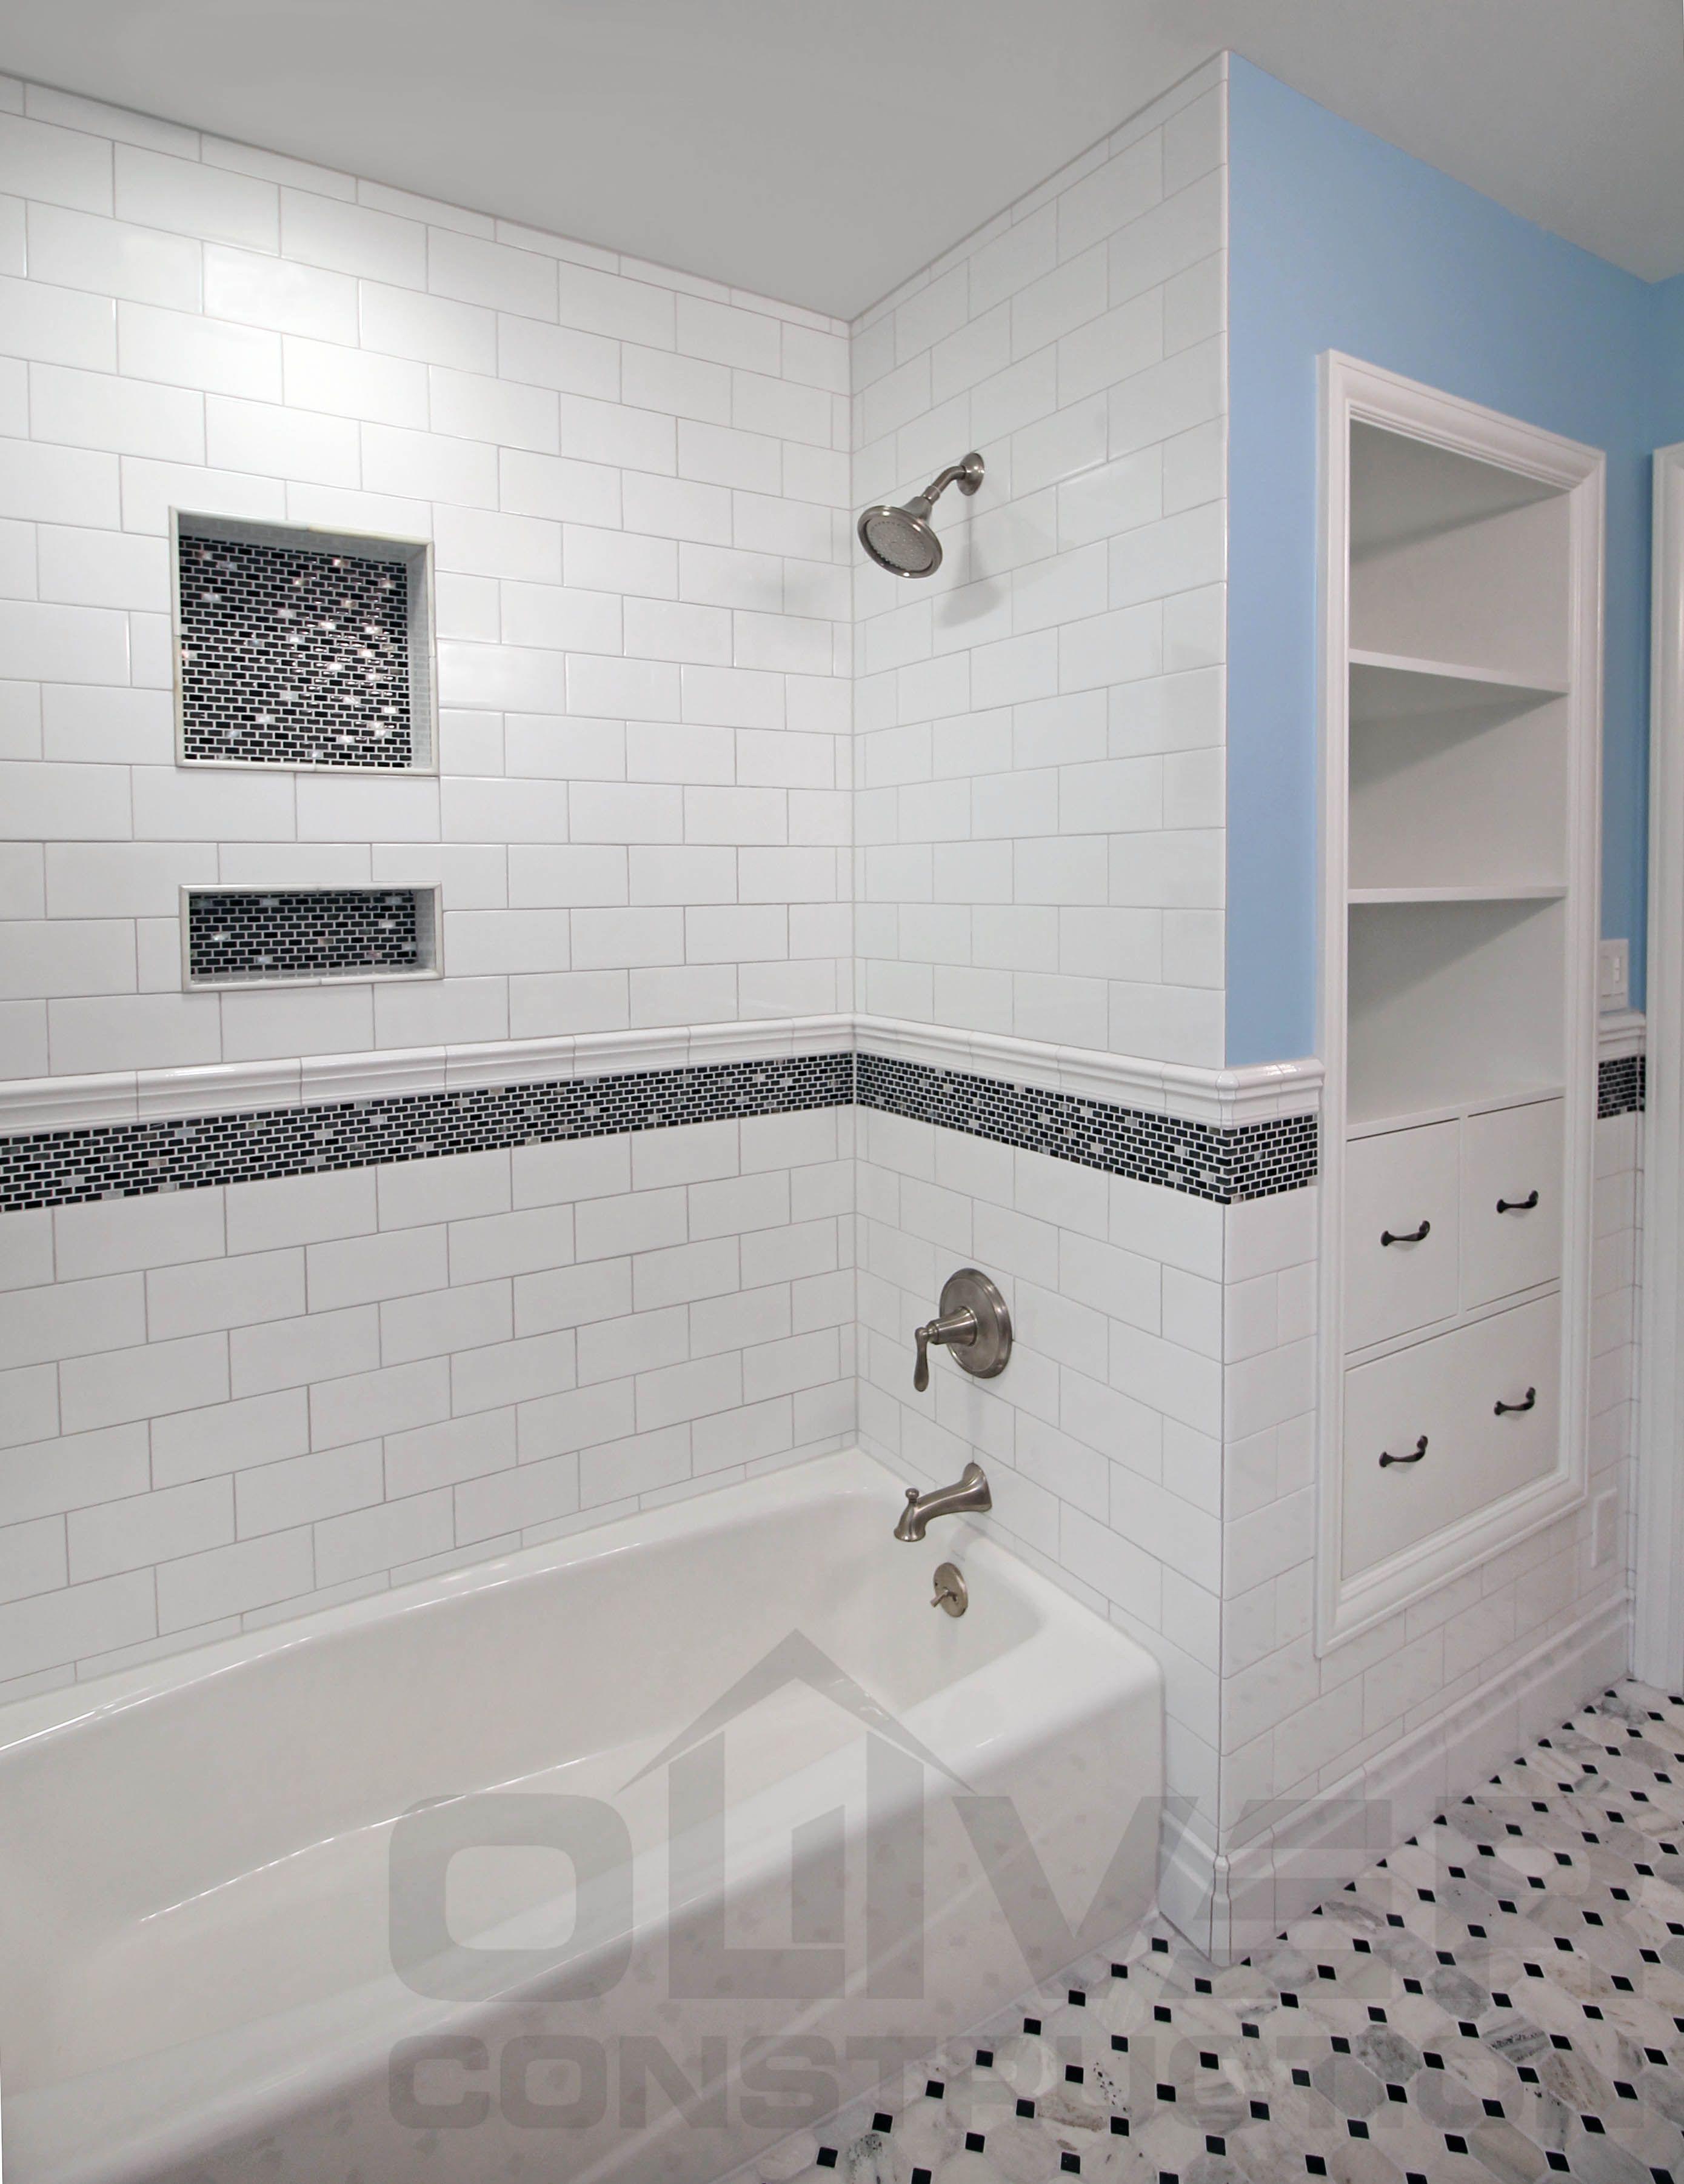 Closet And Bathroom Combo Room Ideas Https Silahsilah Com Home Decor Closet And Bathroom Combo Ro Accent Tile Bathroom Tub Shower Combo Subway Tiles Bathroom Tile accents in bathrooms